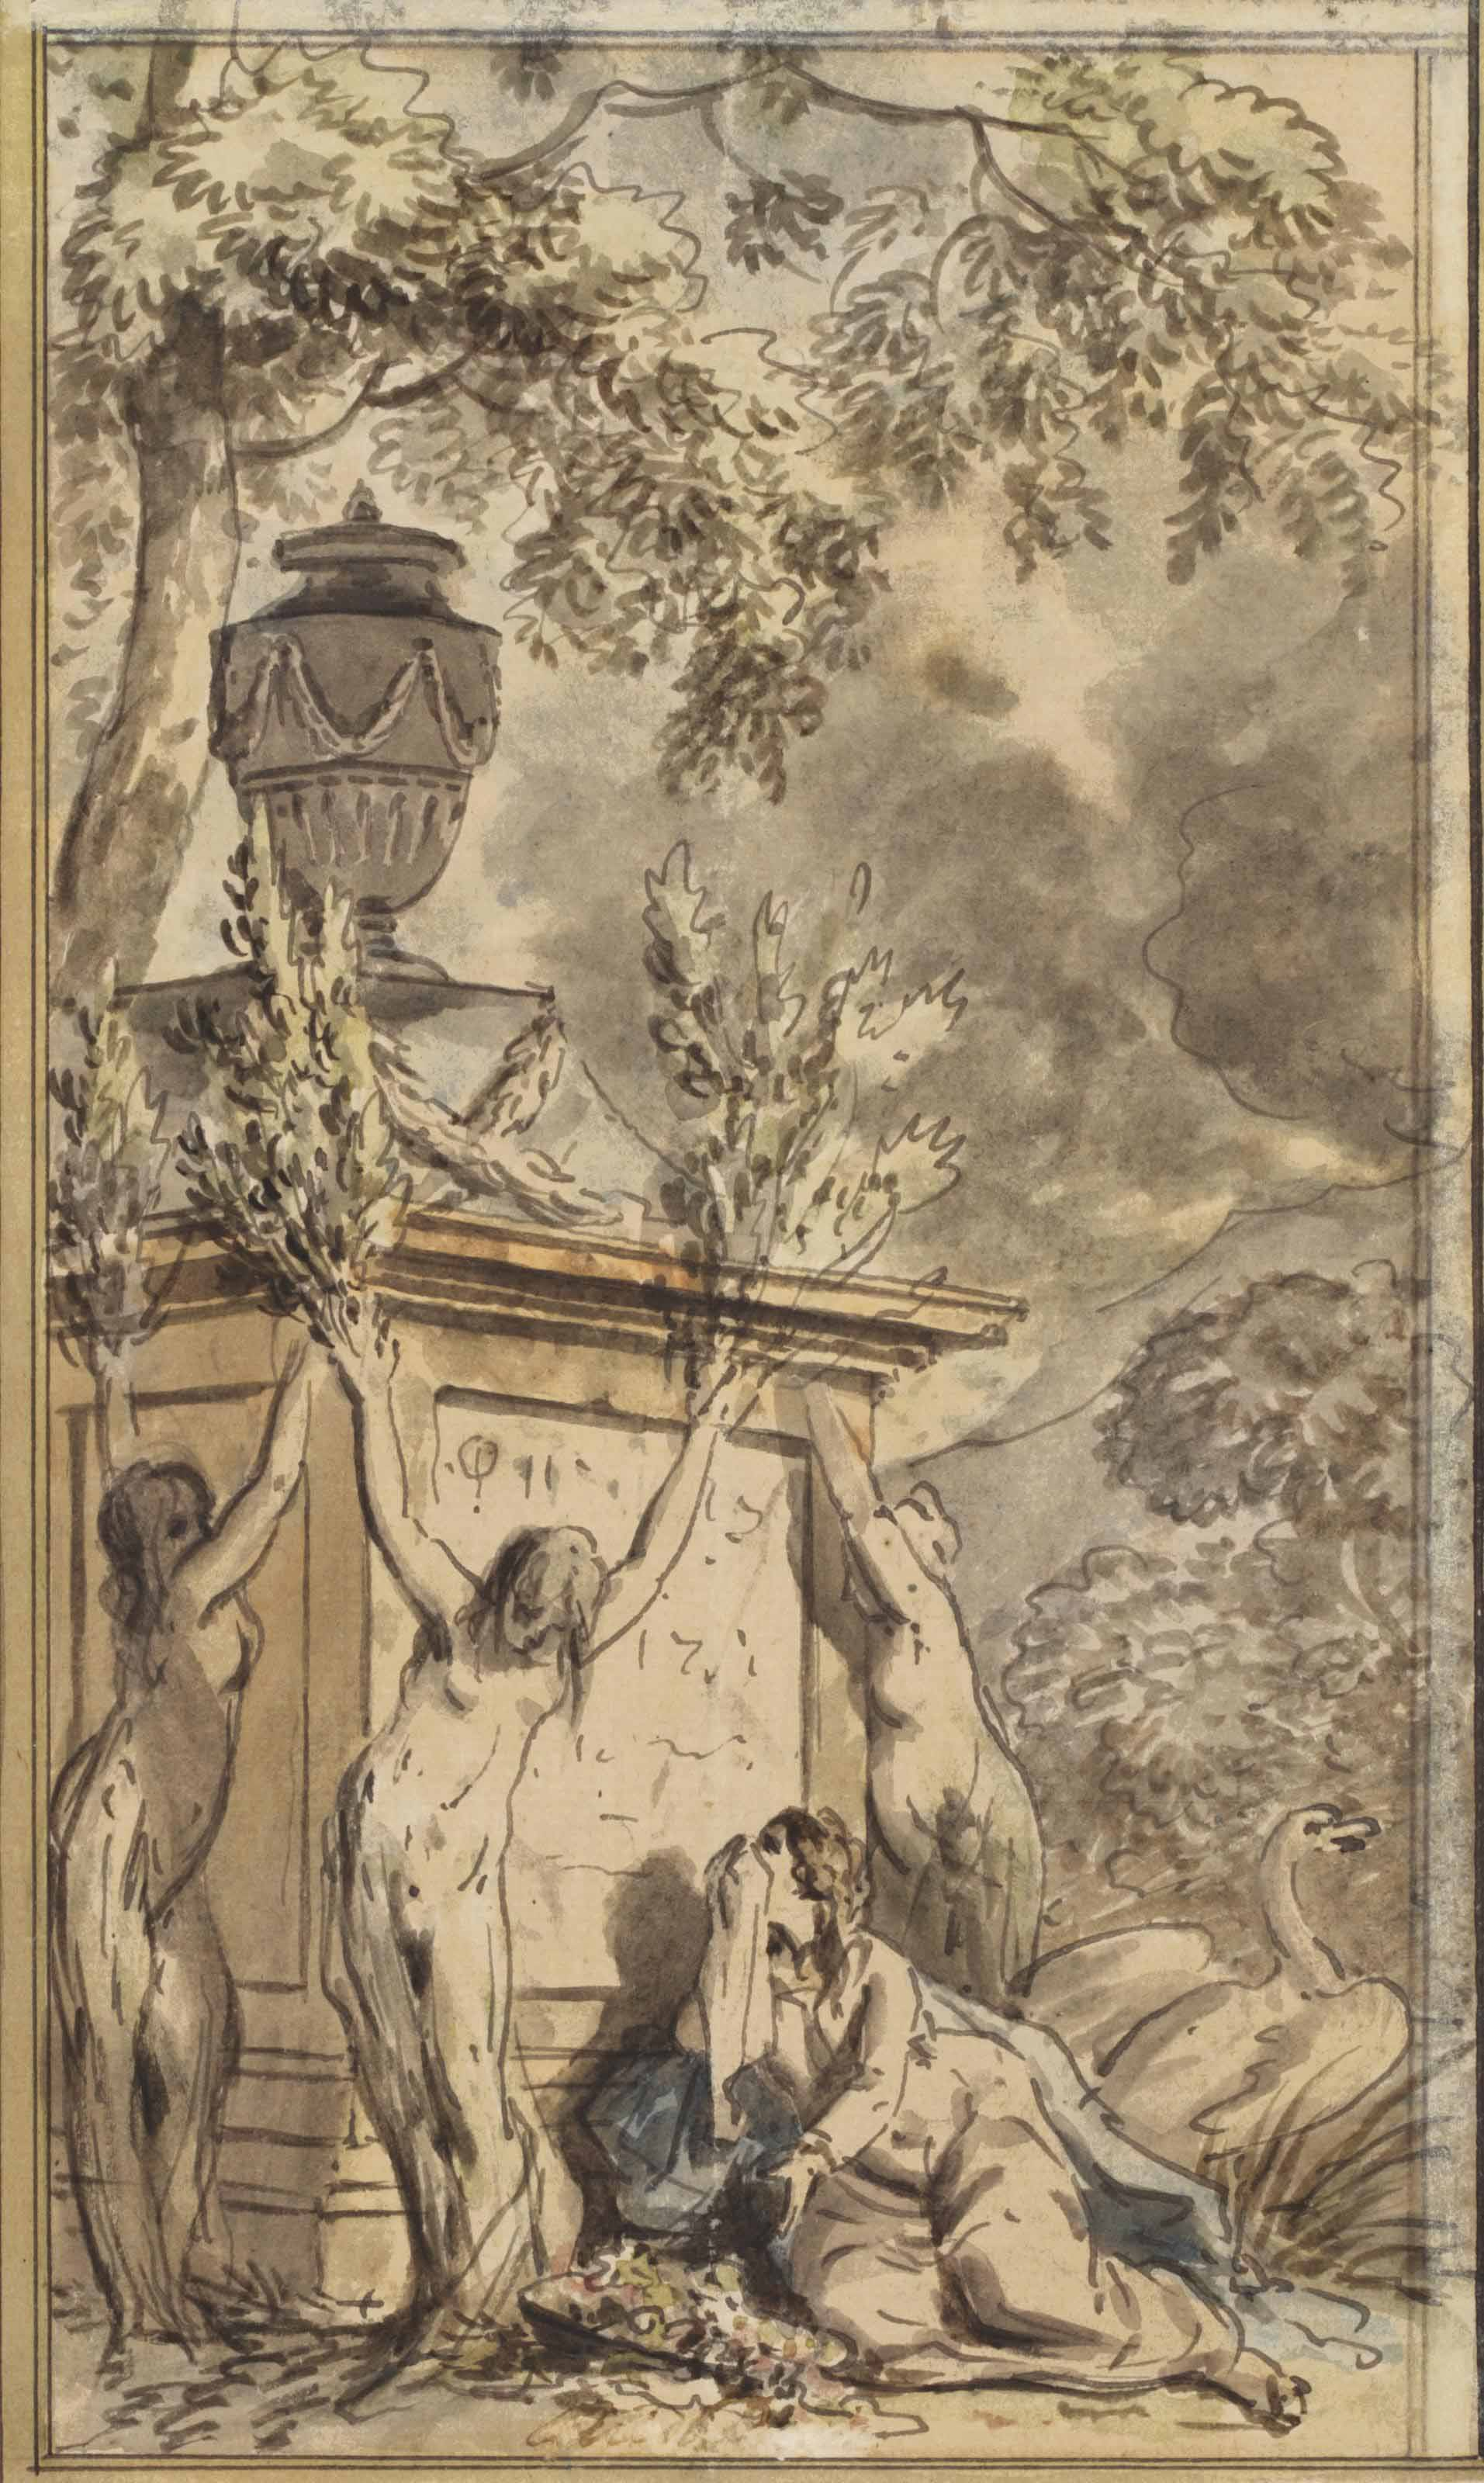 The Tomb of Phaëton